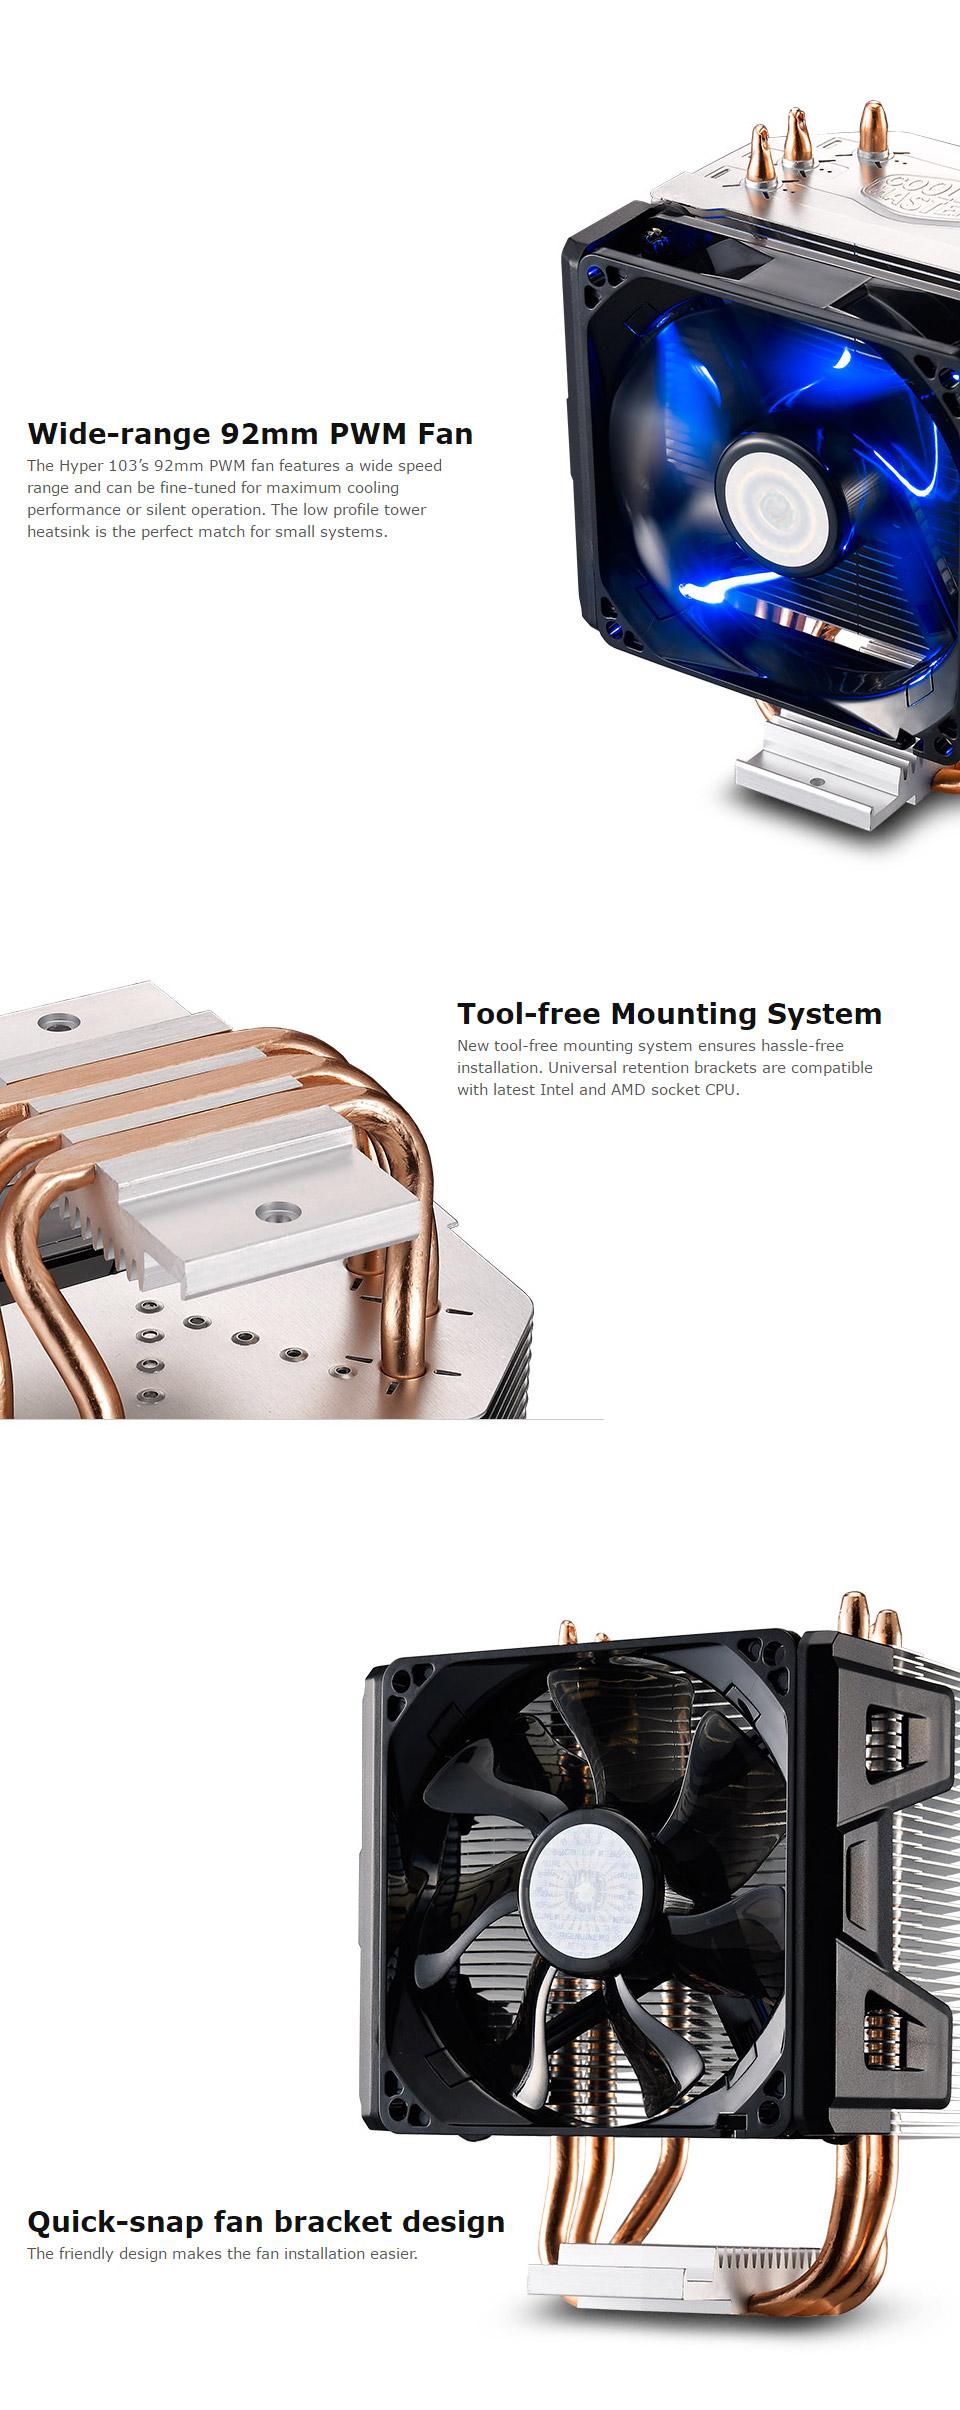 2 Vm Cat Prod Multi Core X8 4x Super Fans Upto 17 Deepcool Notebook Cooler Rr H103 22pb R1 F 02